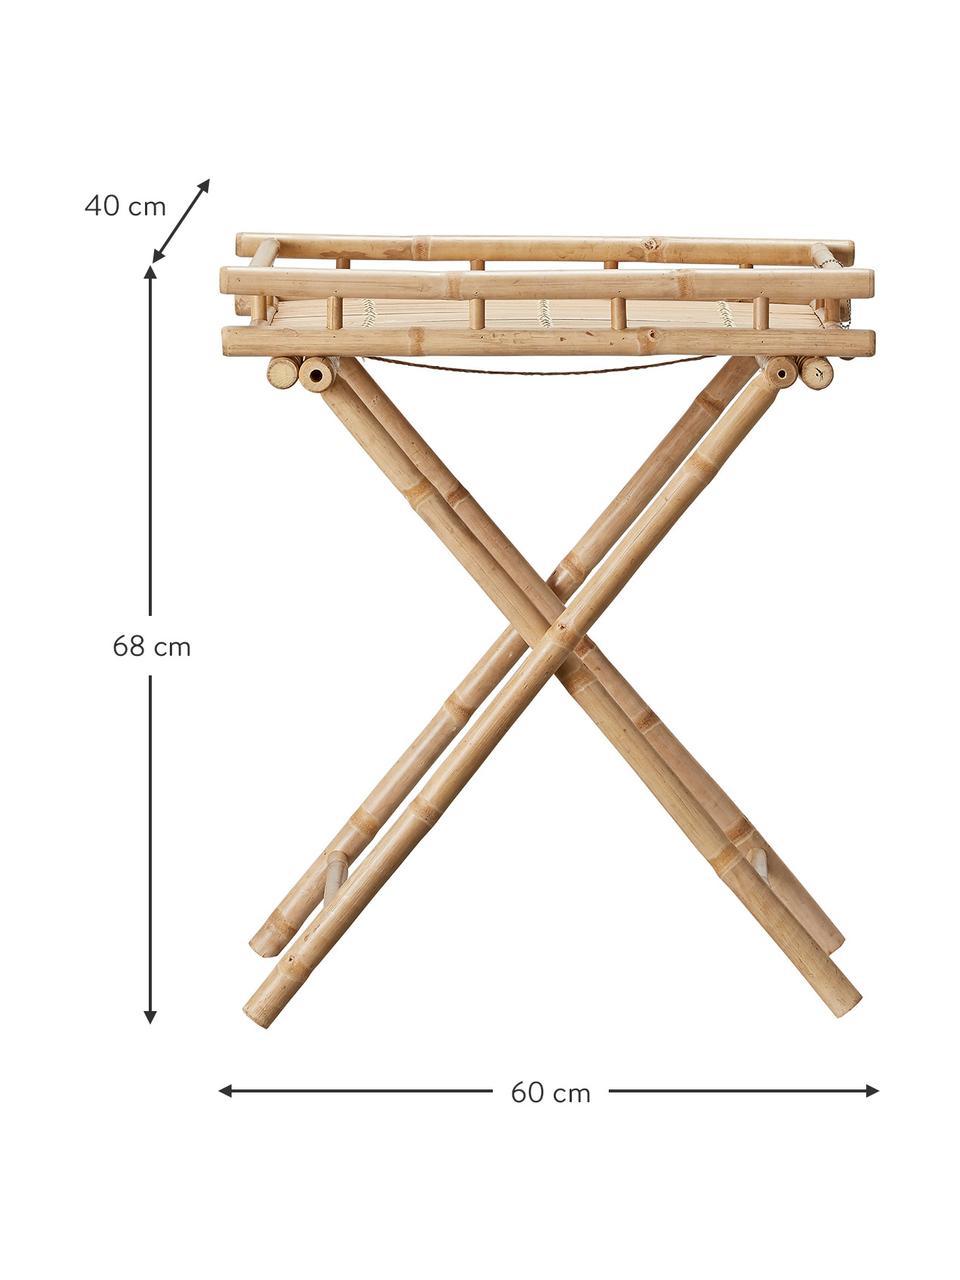 Tavolino pieghevole da giardino in bambù Mandisa, Bambù, finitura naturale, Bambù, Larg. 60 x Alt. 68 cm